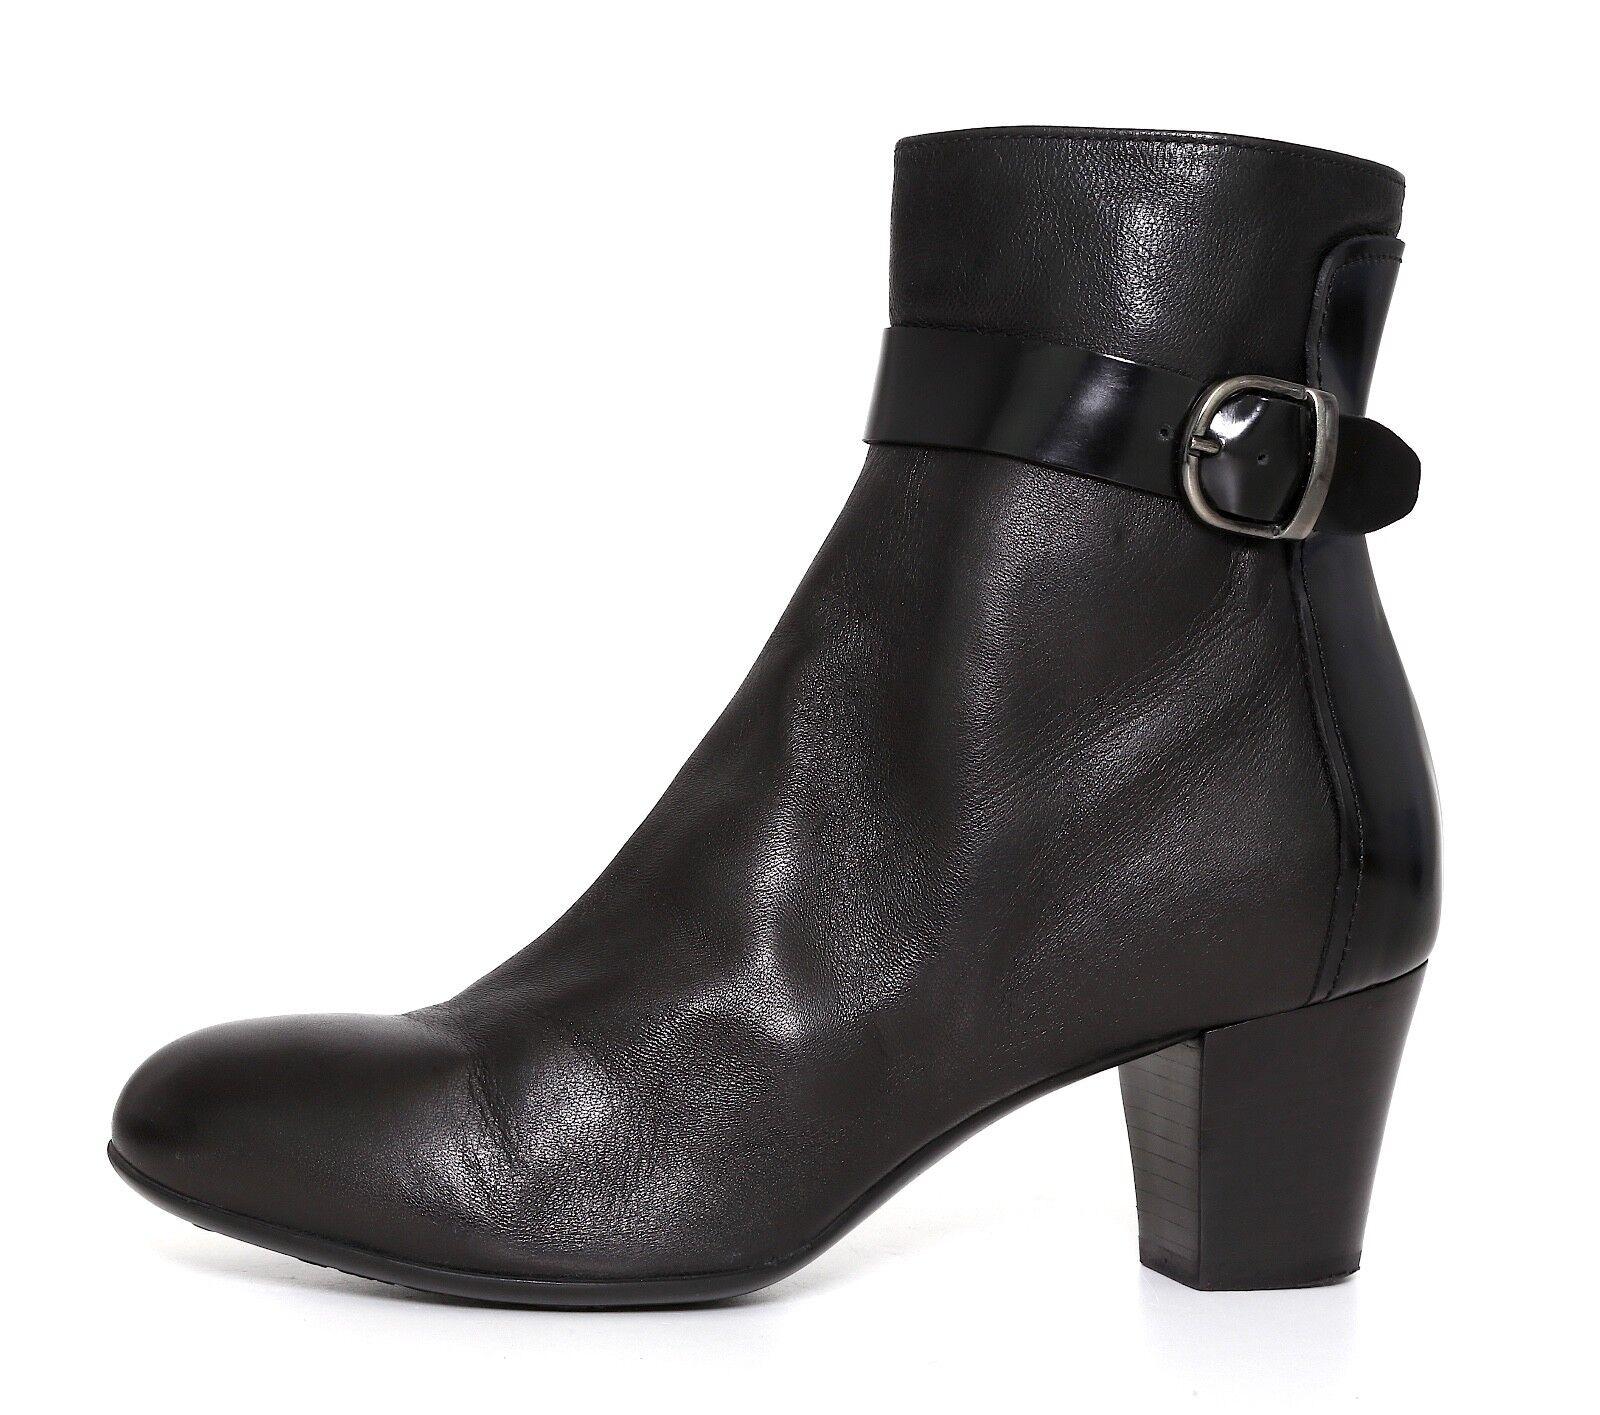 Attilio Giusti Leombruni City Leather Ankle Bootie Black Women Sz 37.5 EUR 5153